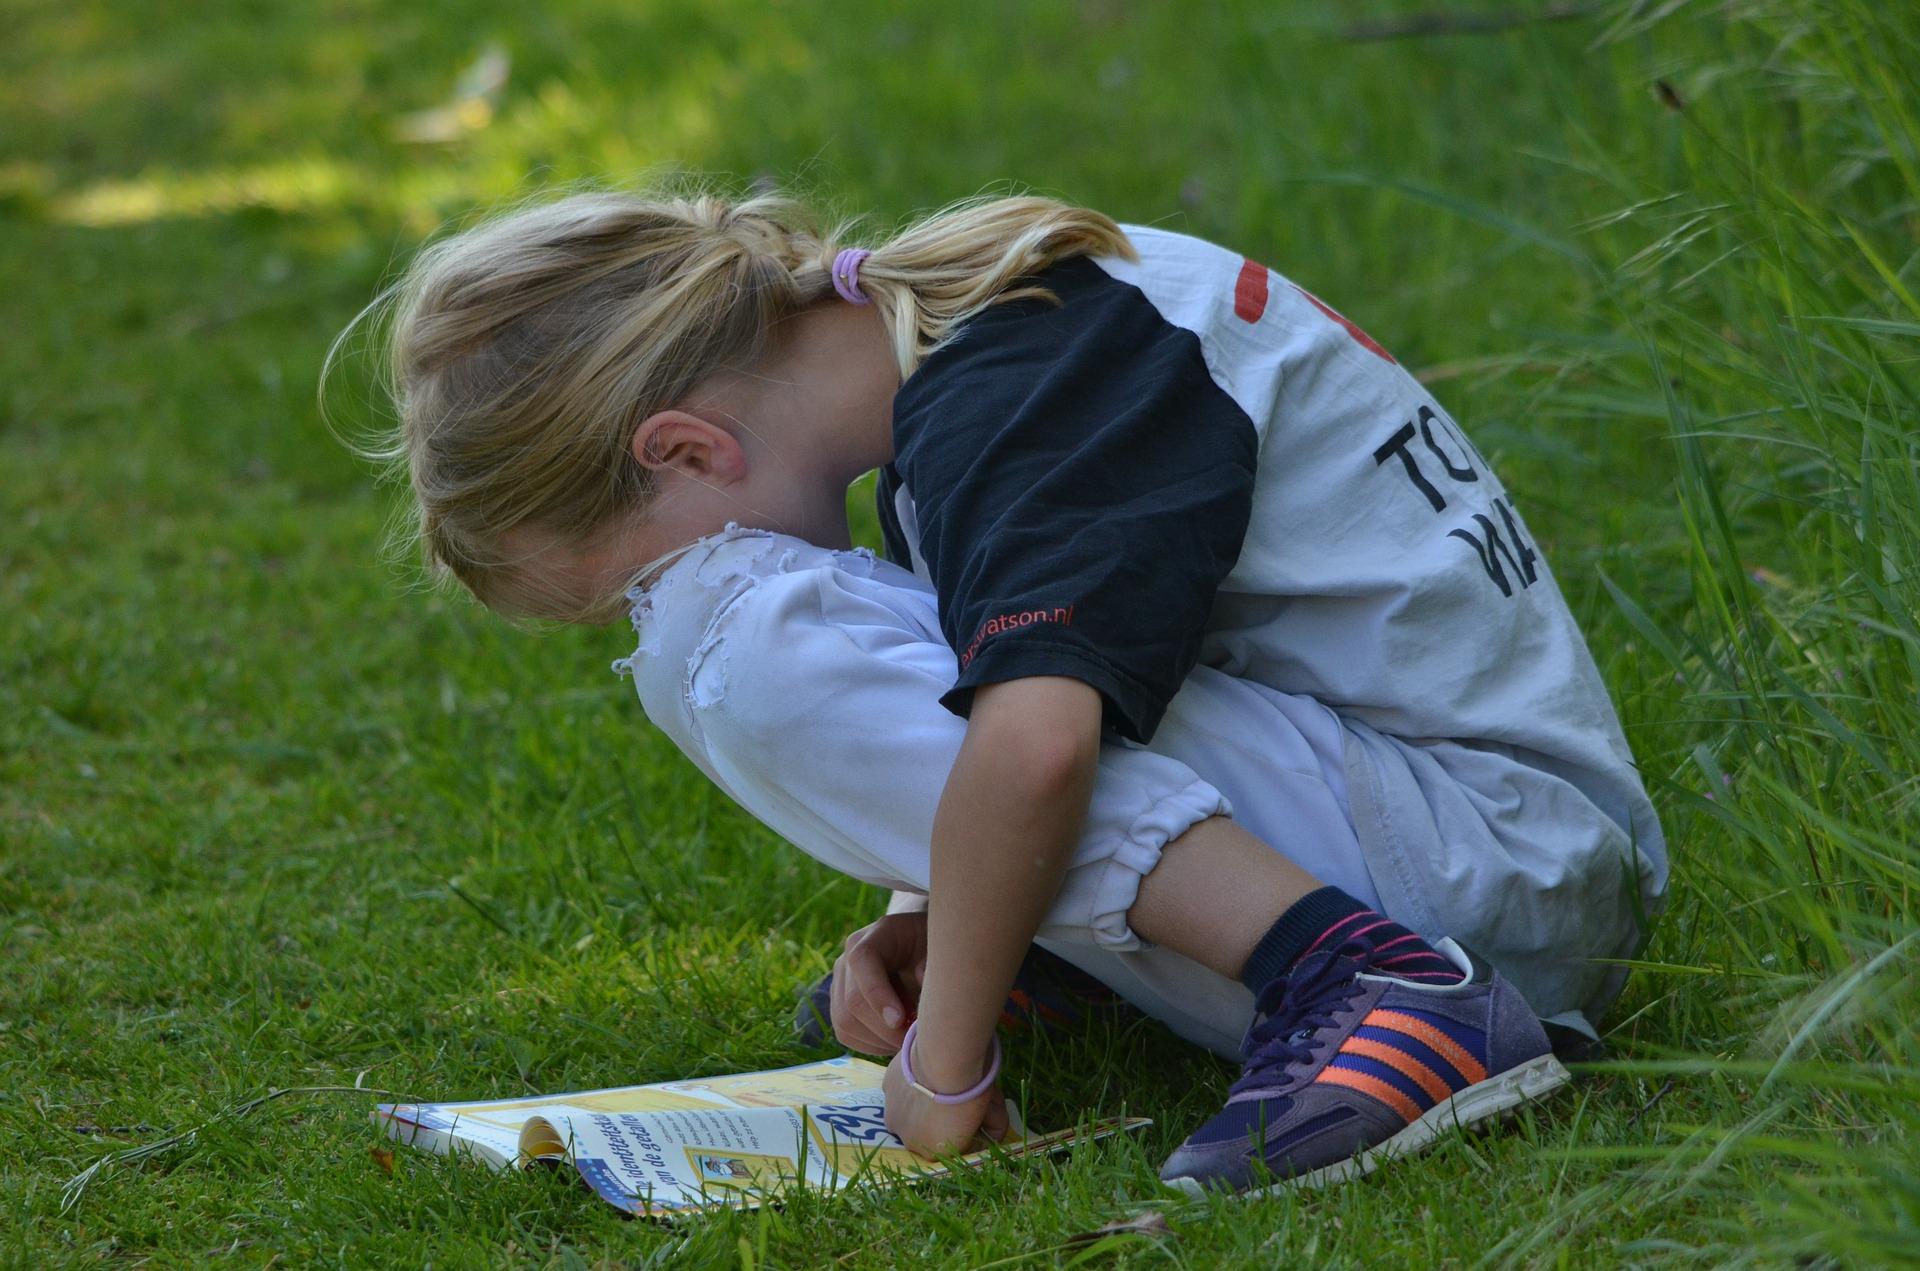 Intensivt lesekurs: Hvem, hvordan og hvorfor (og hvorfor ikke)